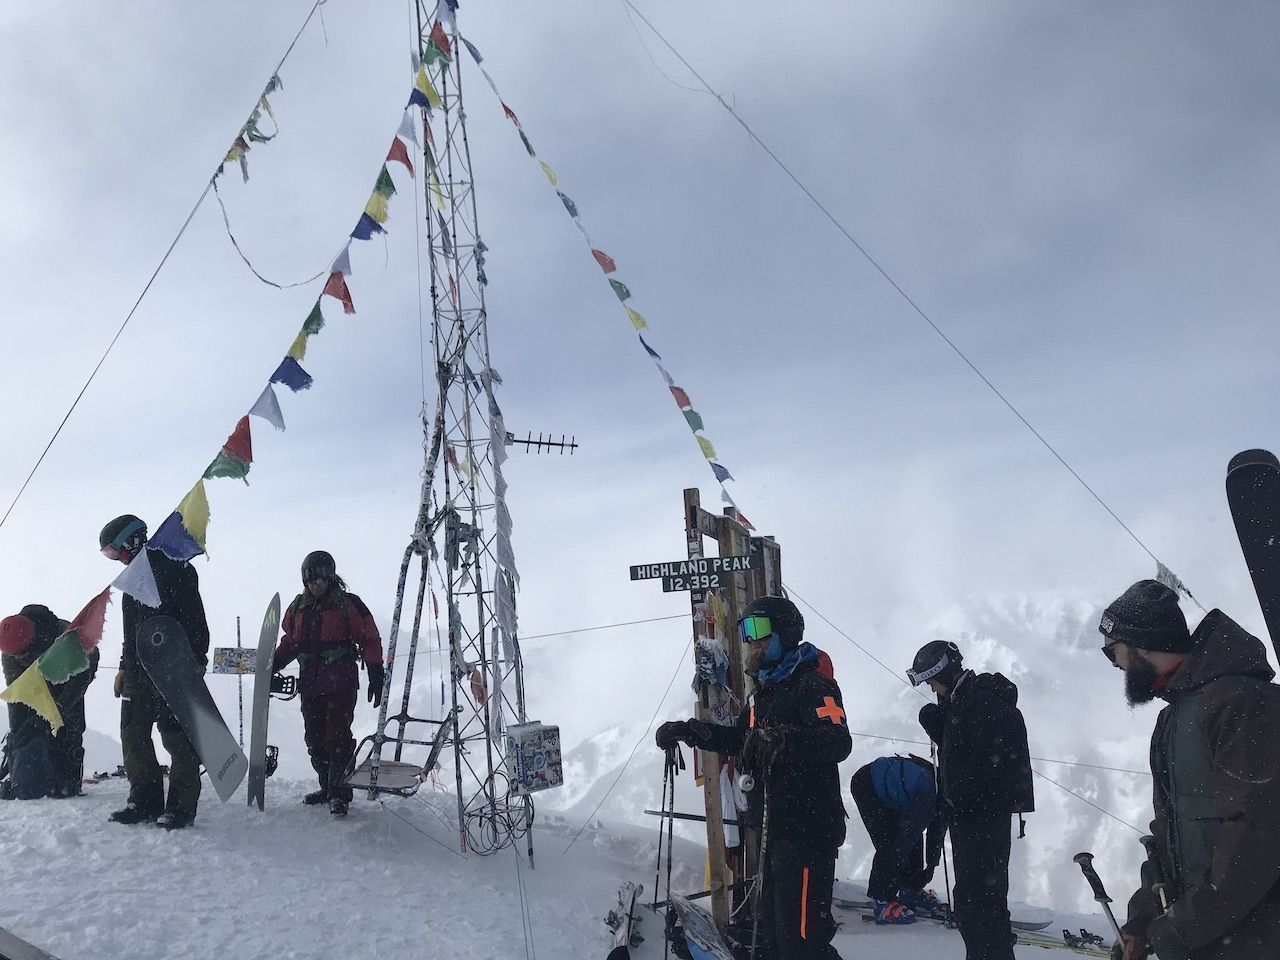 Highland peak summit in Aspen, Colorado